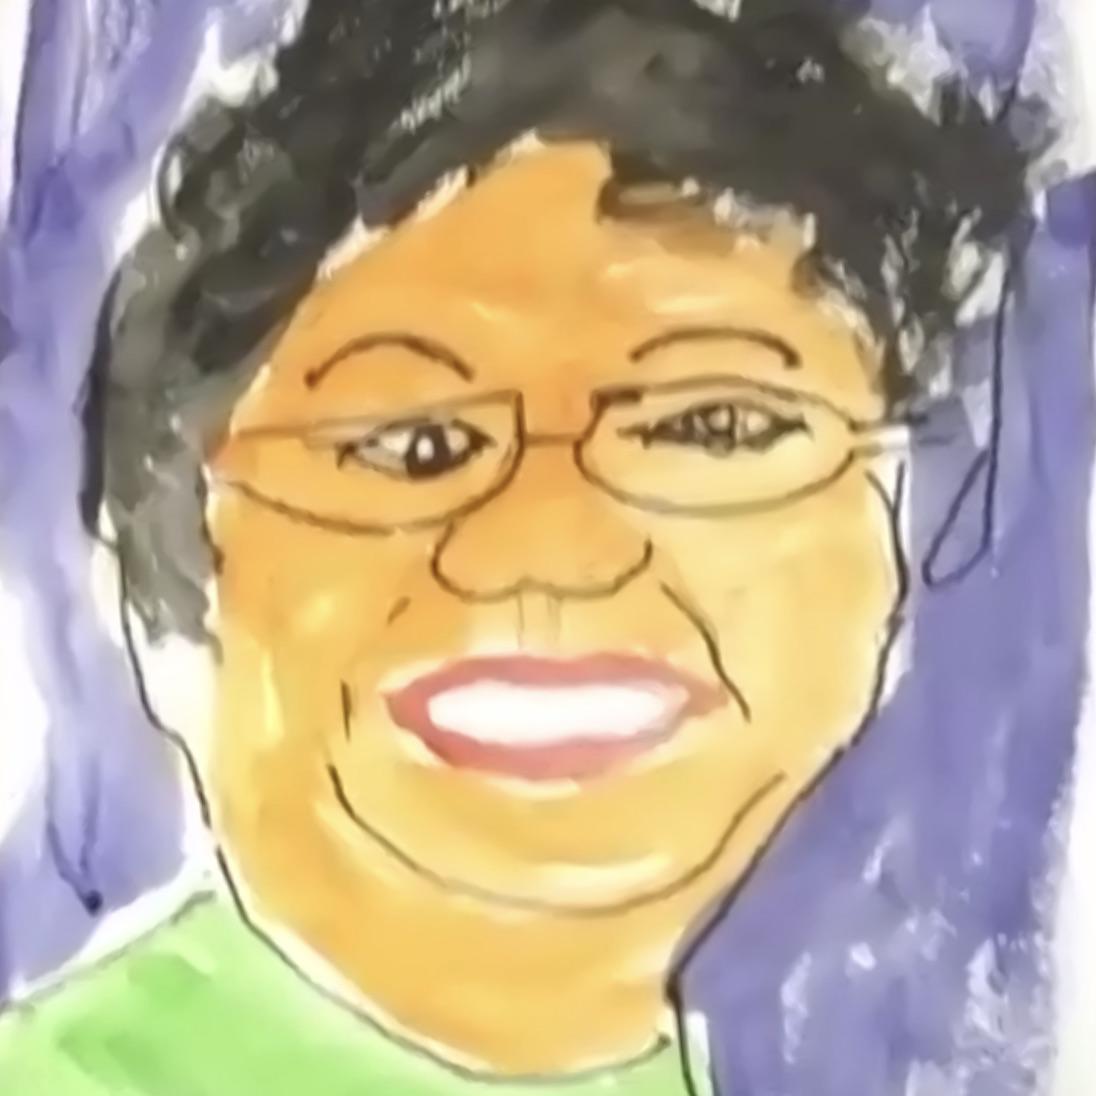 18.Kim-portrait